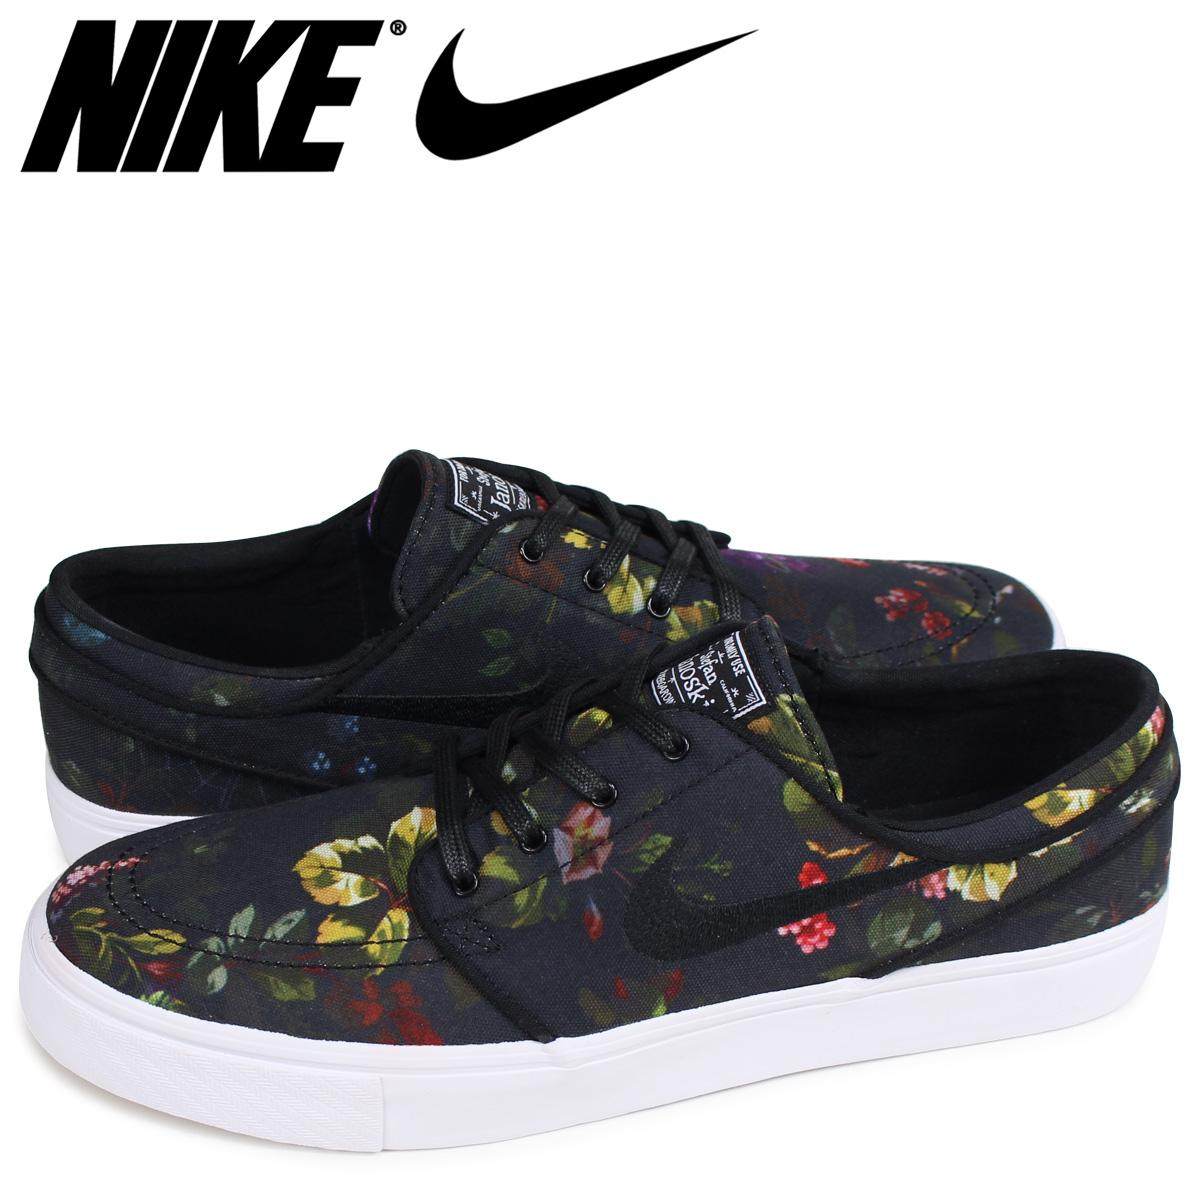 Nike Zoom Stefan Janoski Canvas Floral Color Multi Black White 615957 900